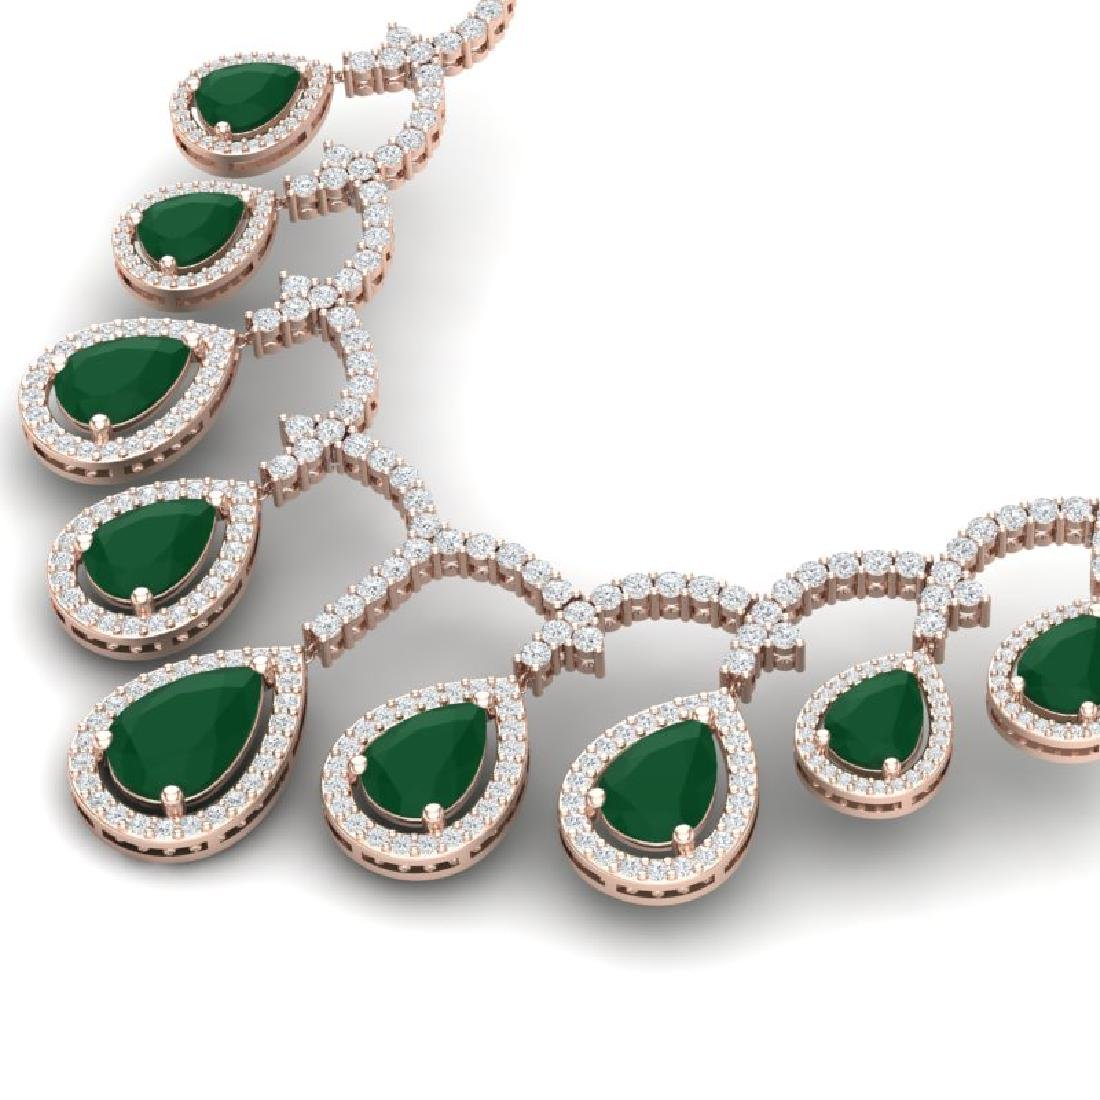 31.5 CTW Royalty Emerald & VS Diamond Necklace 18K Rose - 2